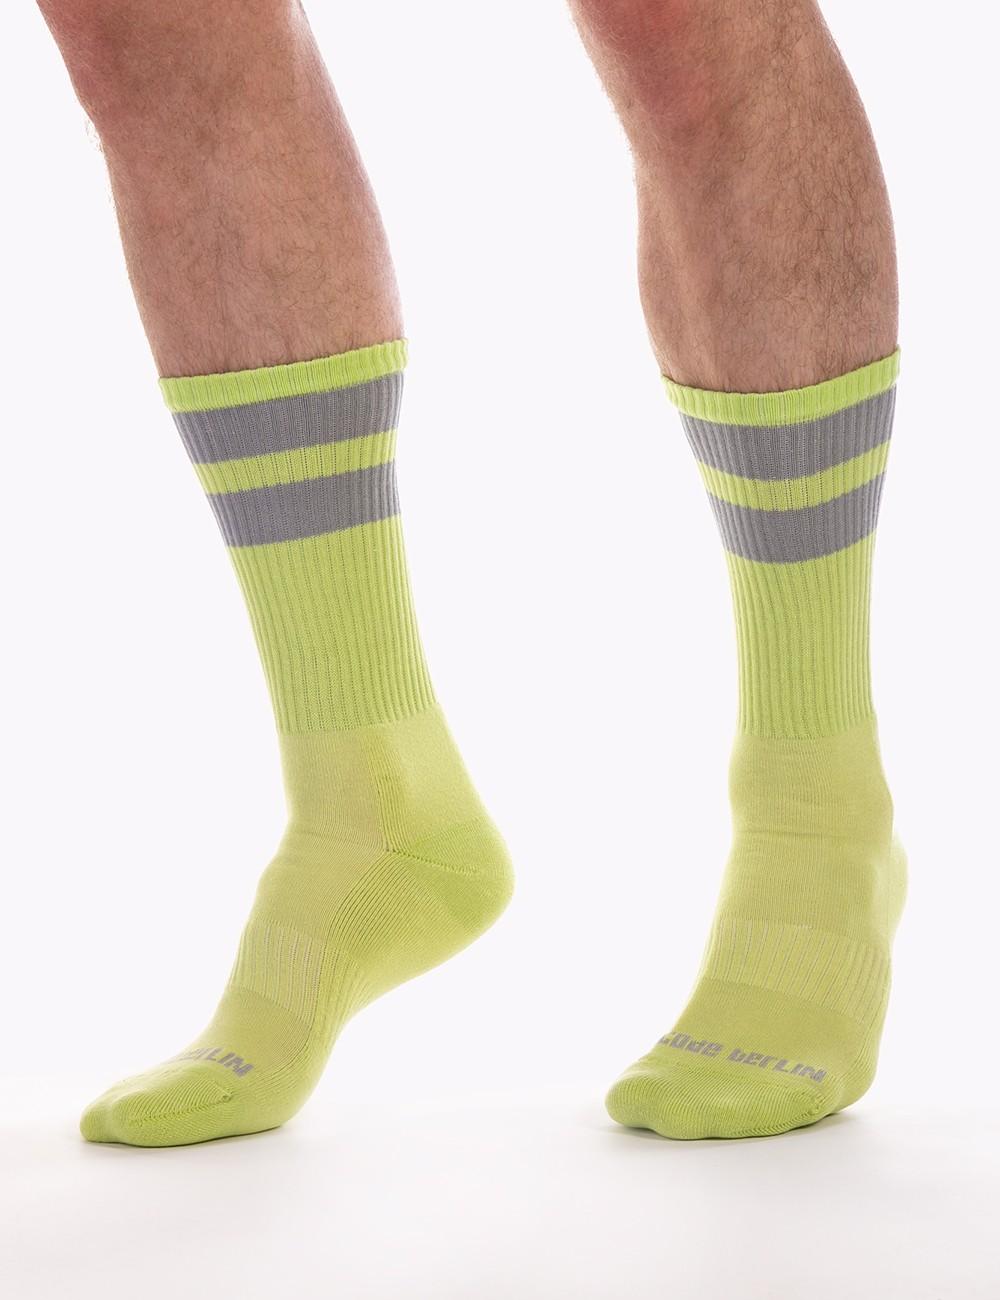 Gym Socks - Neongreen-Grey